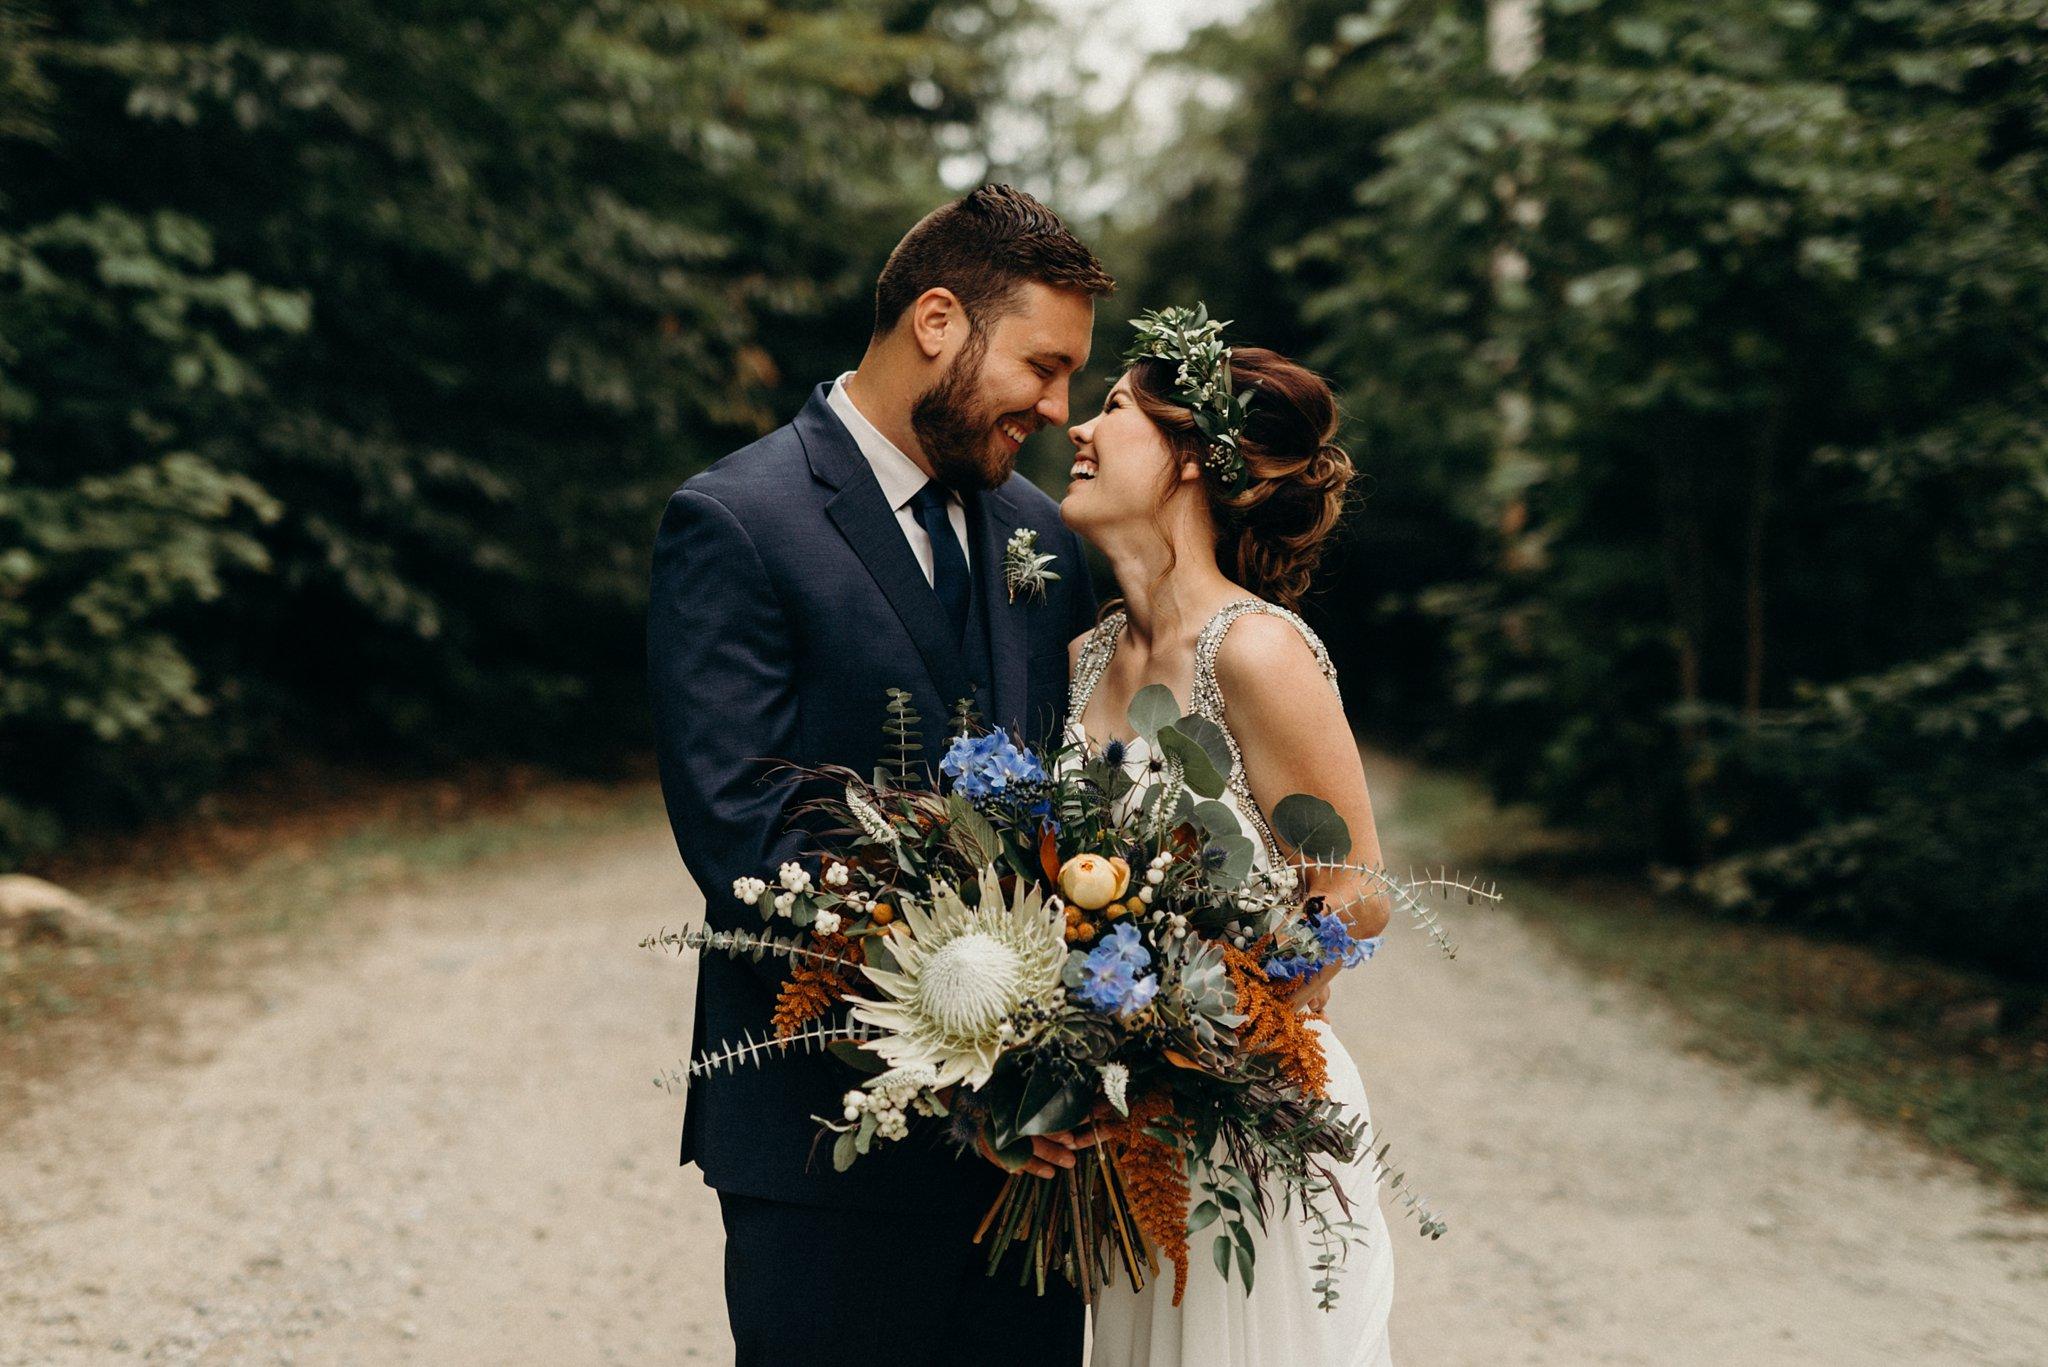 kaihla_tonai_intimate_wedding_elopement_photographer_6600.jpg